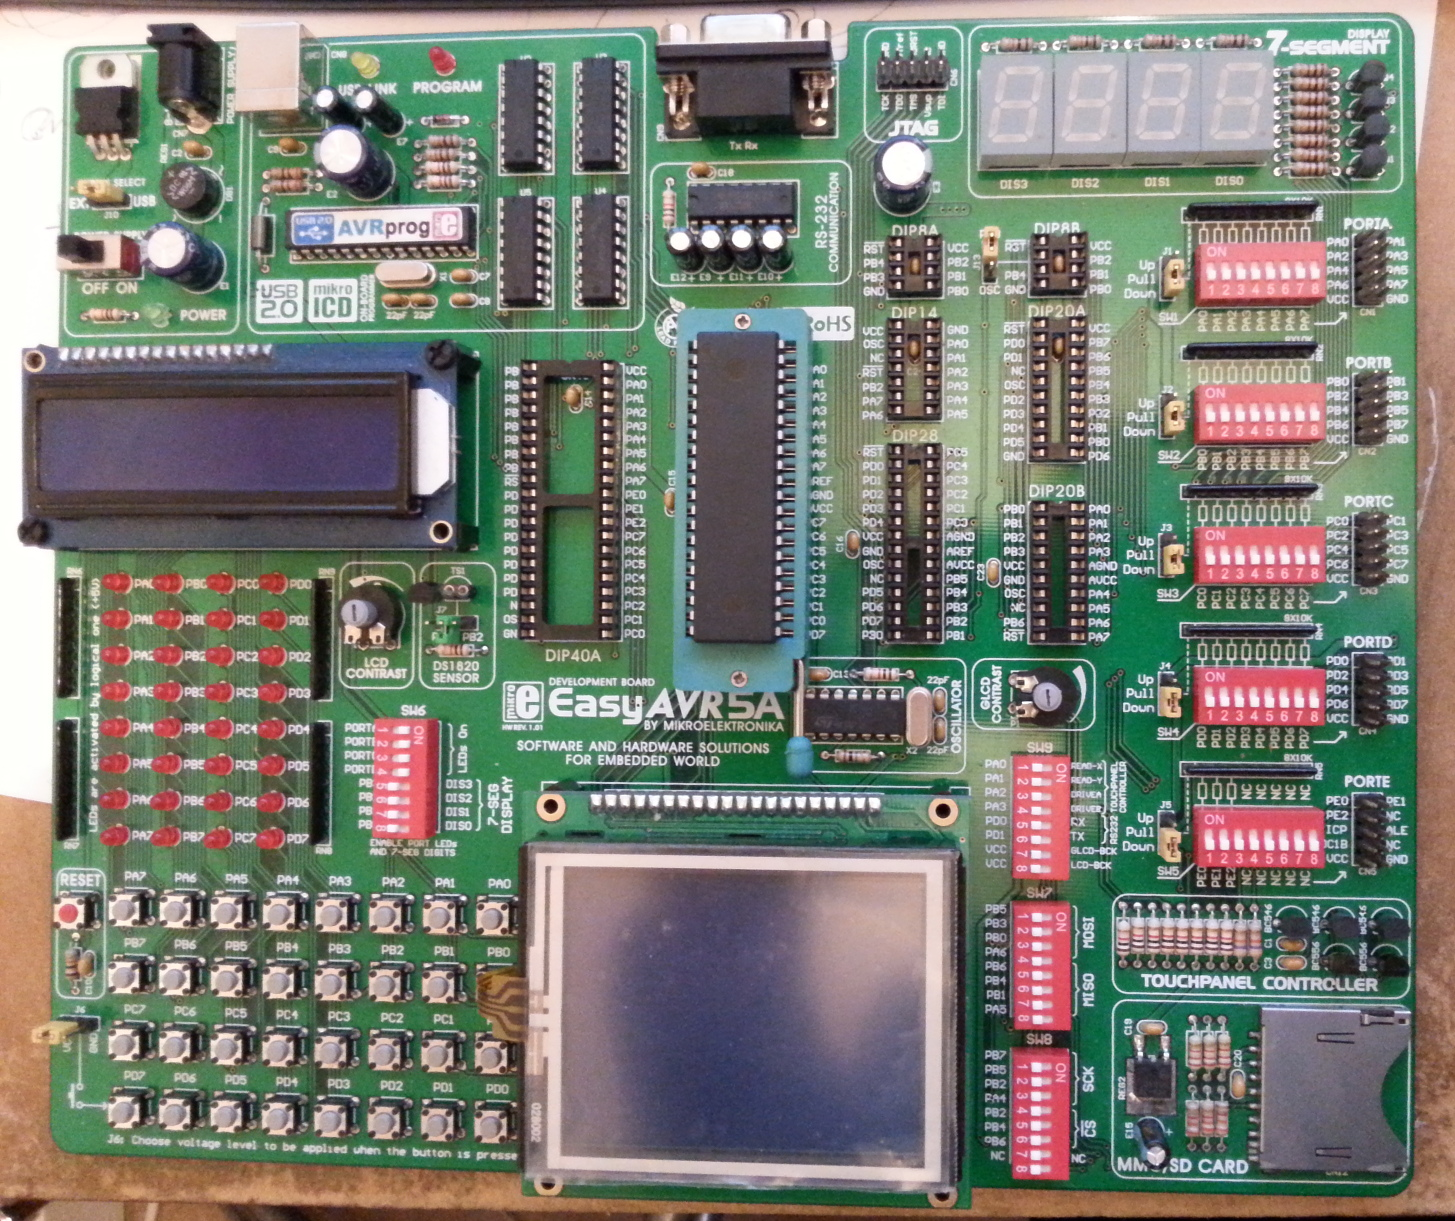 64 The Company Seems To Be Imitating Atmel Usb Programmer Circuit Zif Socket Usbasp Atmega8 4 I Placed It Above